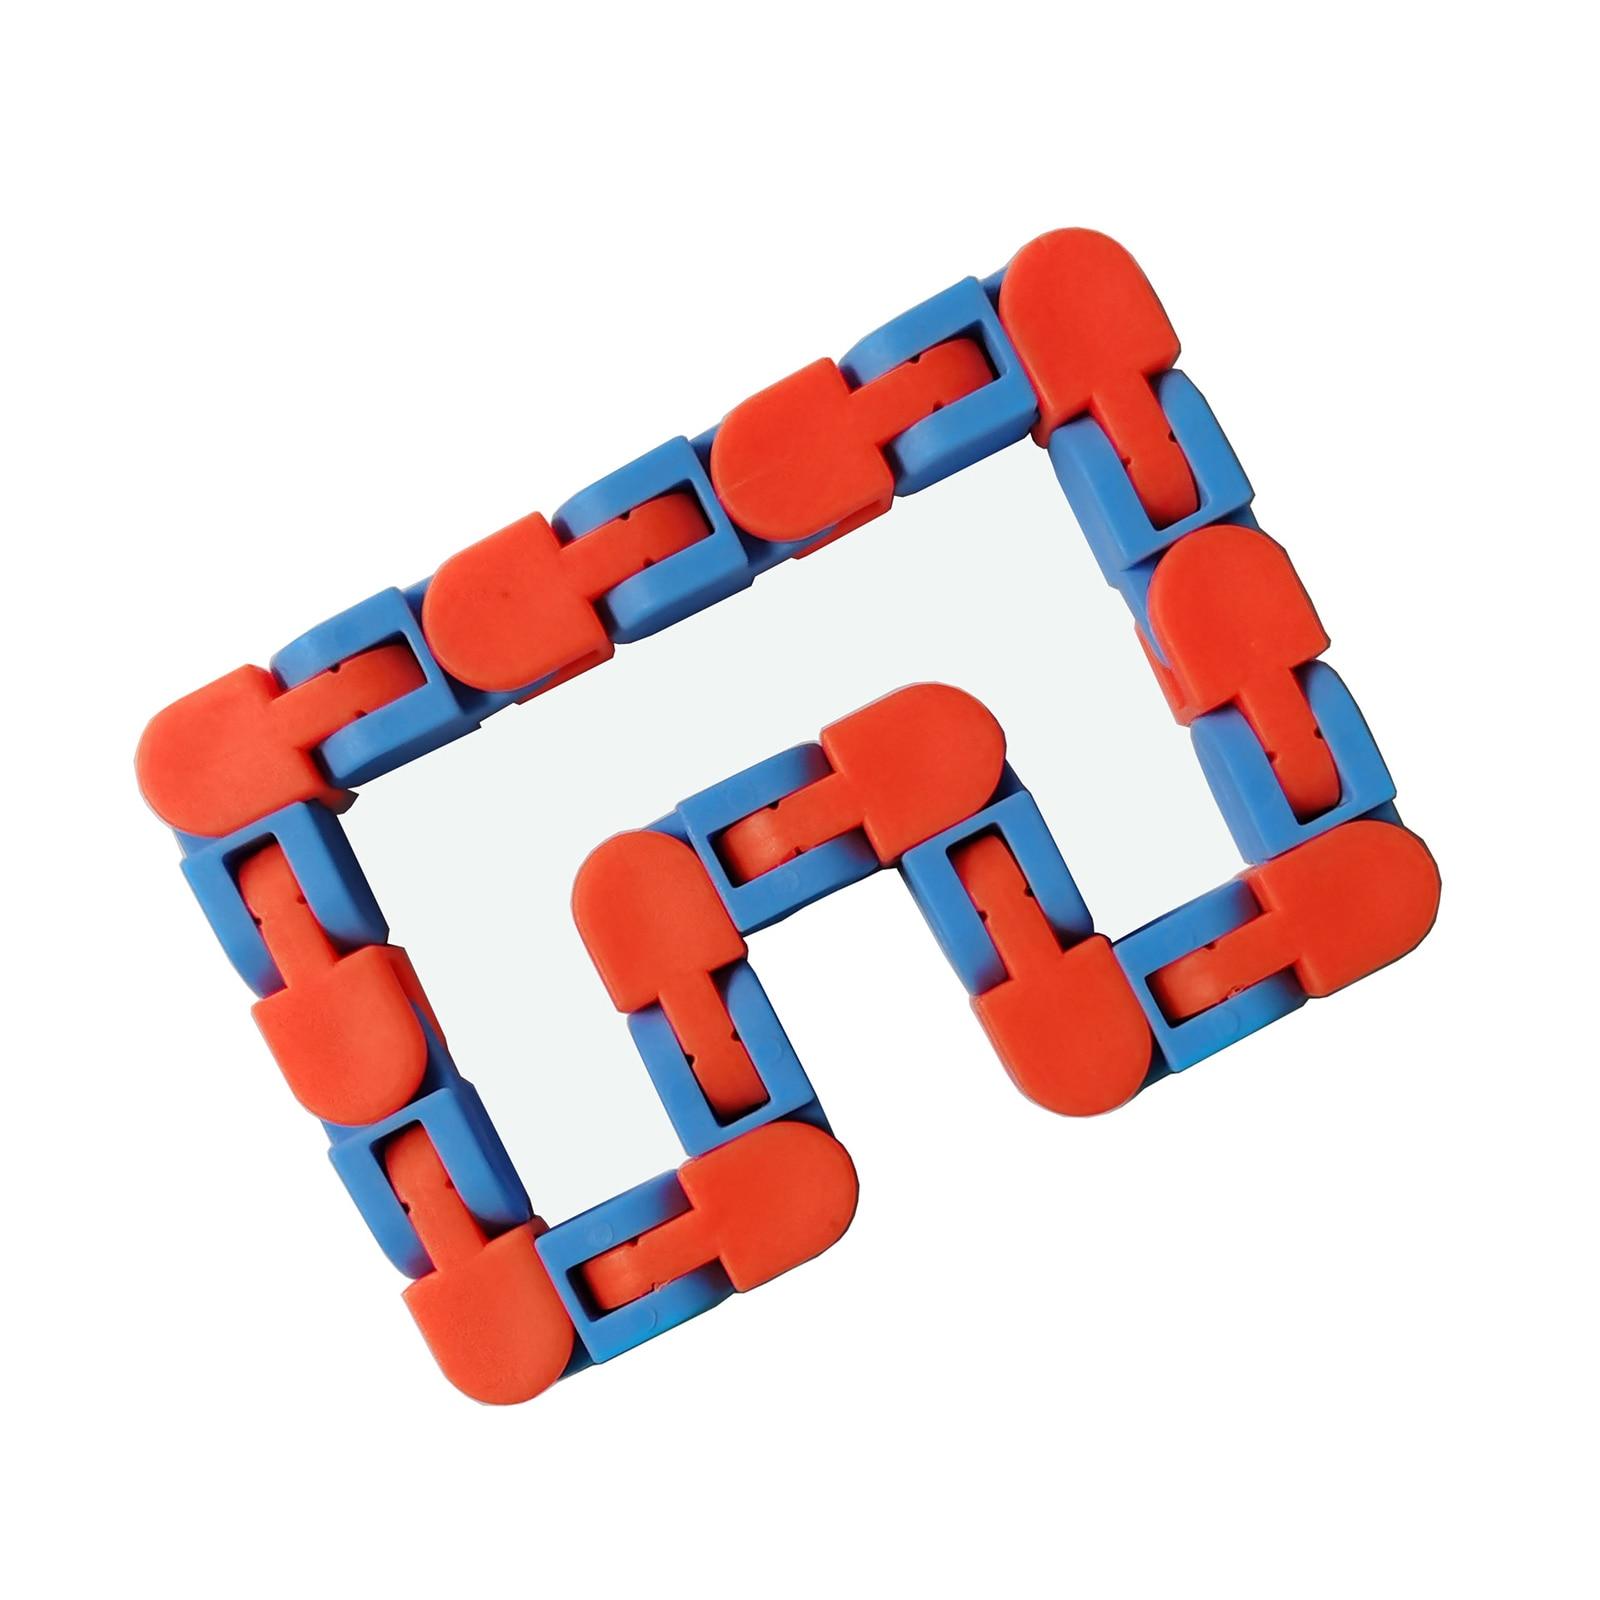 Toy-Kit Sensory-Toy-Set Relief-Toys Fidget-Hand-Toys Autism Stress Decompression Pop img5